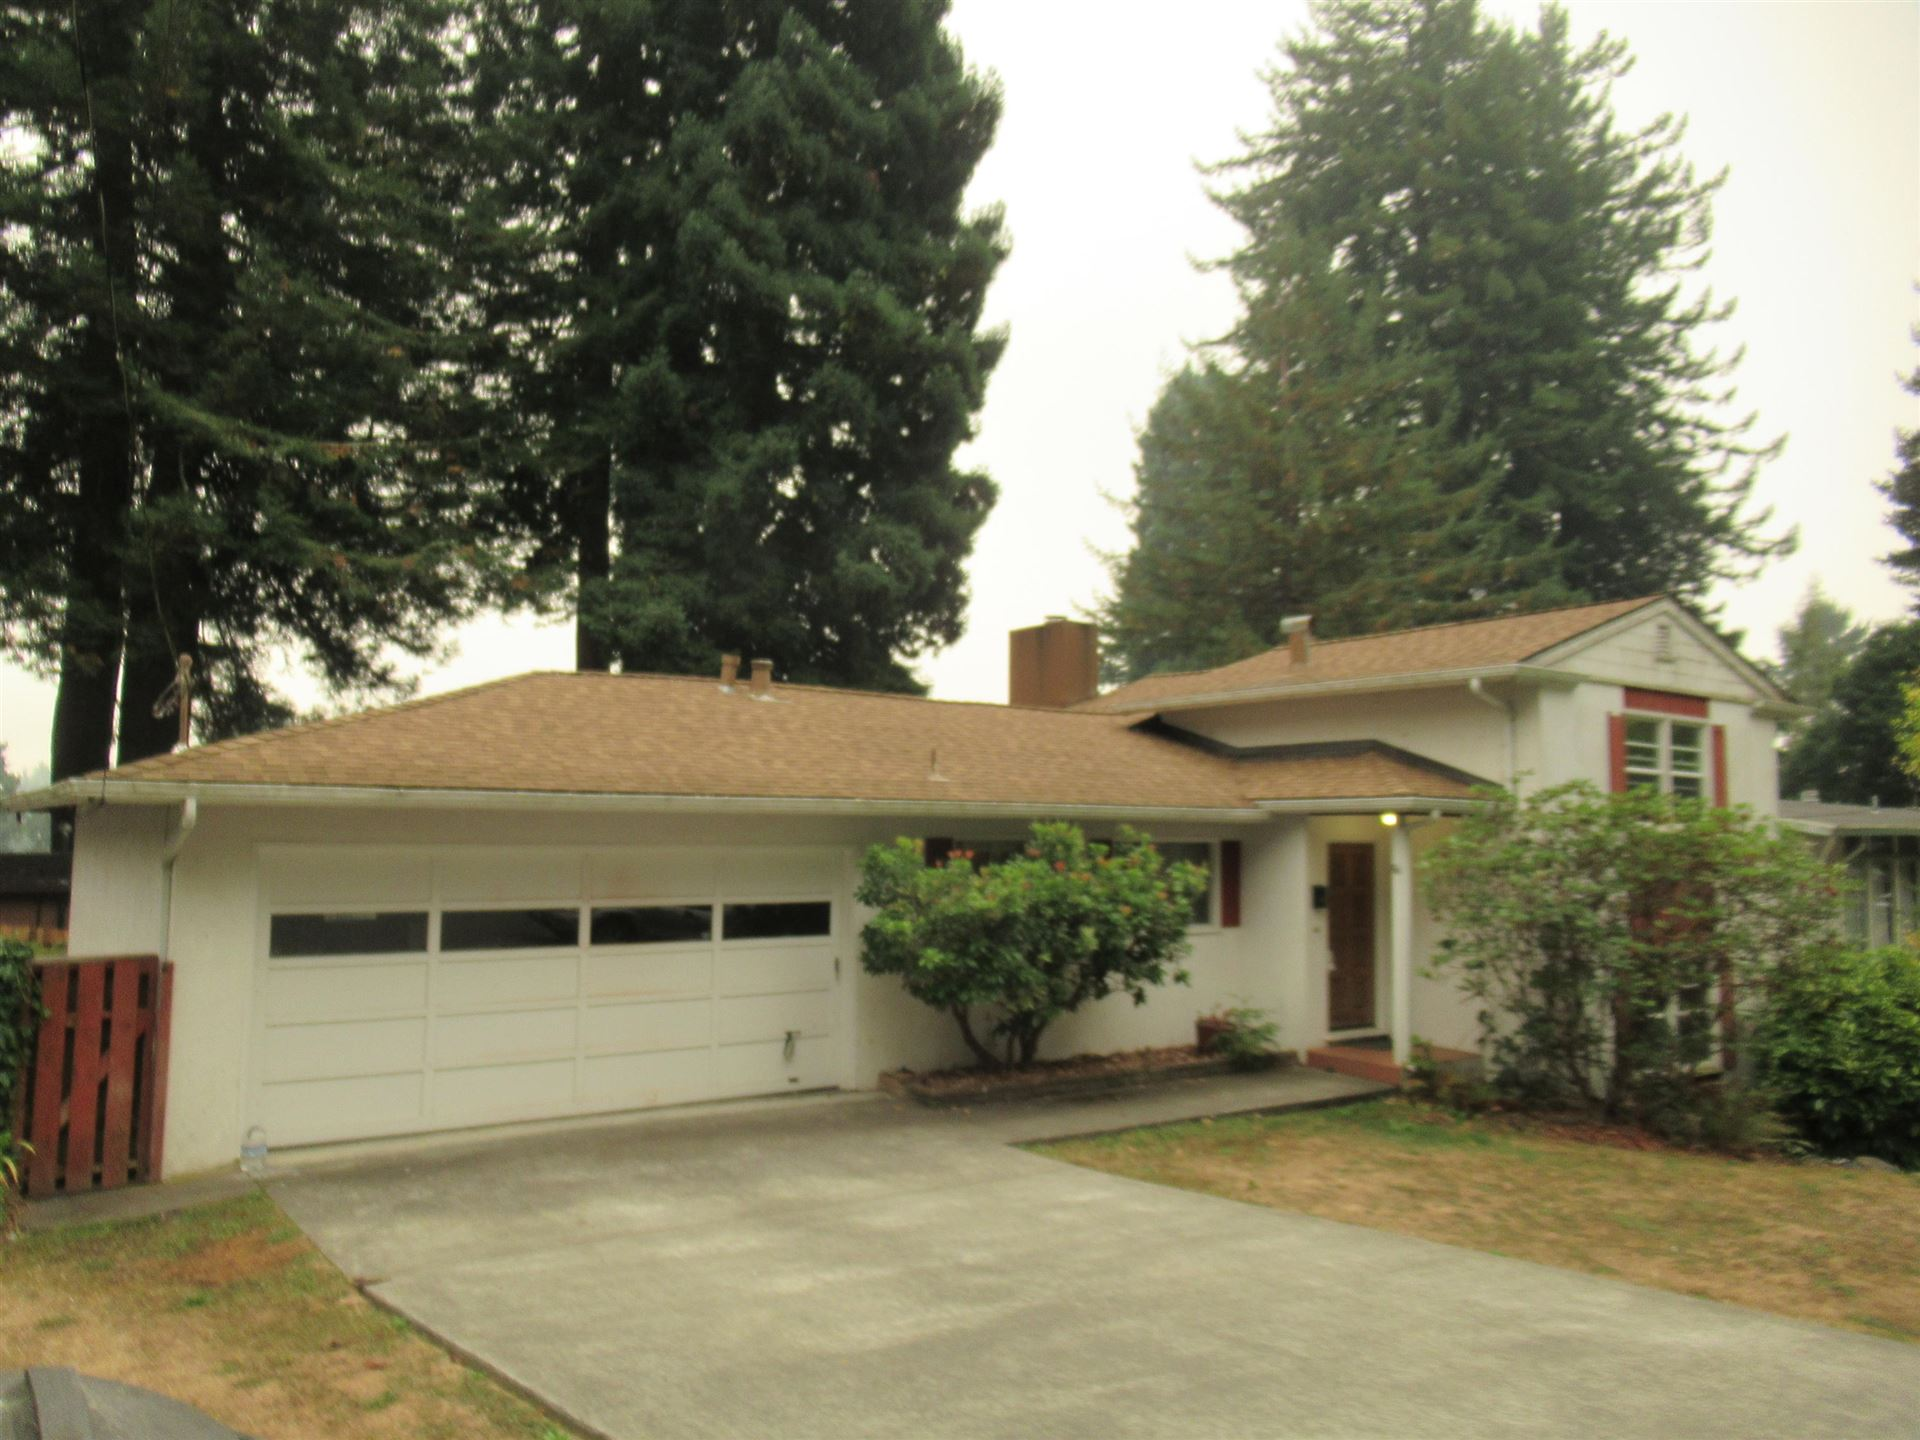 1685 Charles Avenue, Arcata, CA 95521 - MLS#: 257446